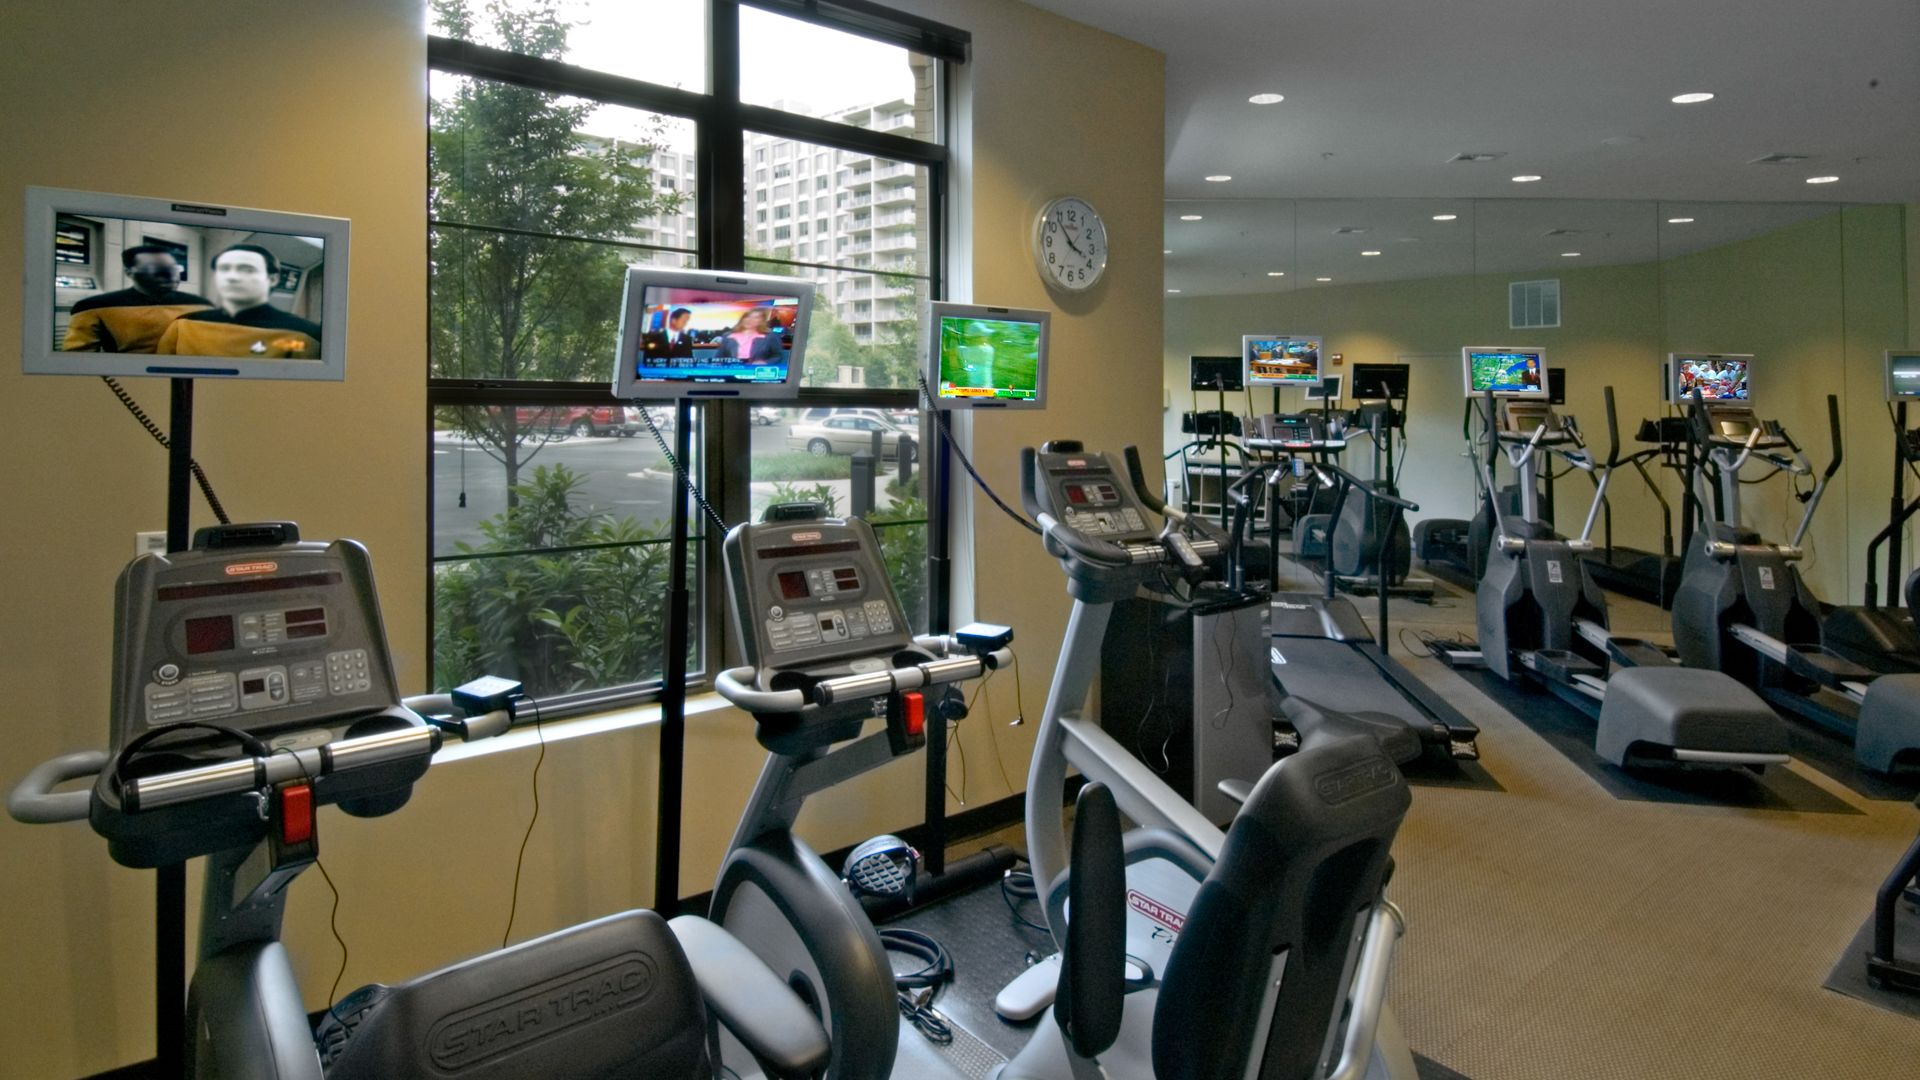 Lofts 590 Apartments Fitness Center